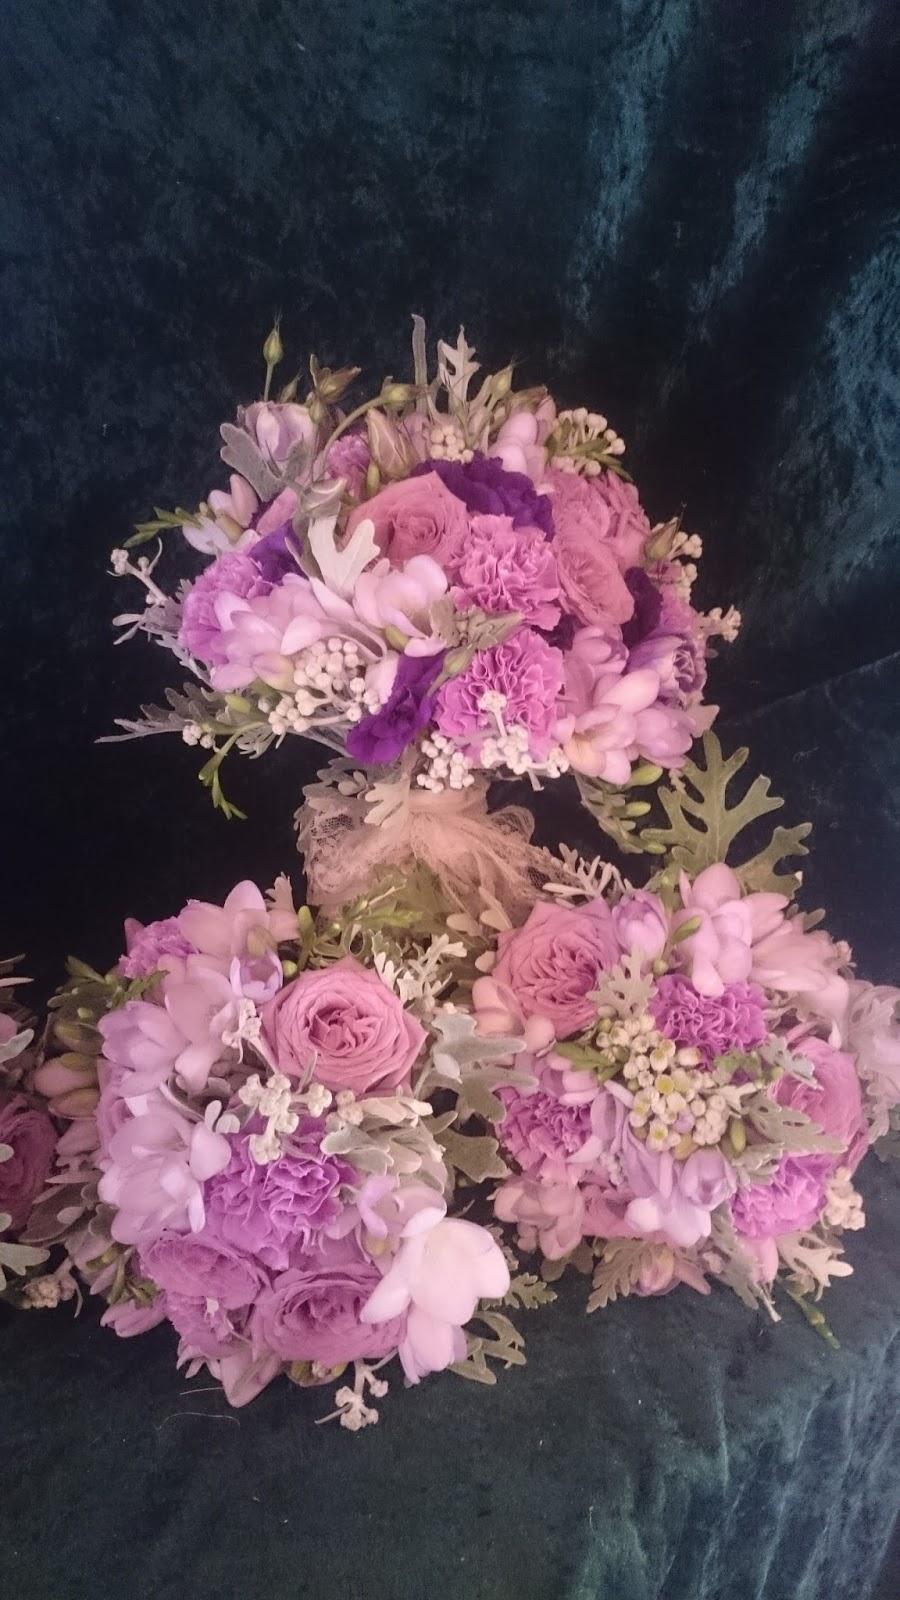 sandra 39 s flower studio purple and lilac wedding flowers. Black Bedroom Furniture Sets. Home Design Ideas